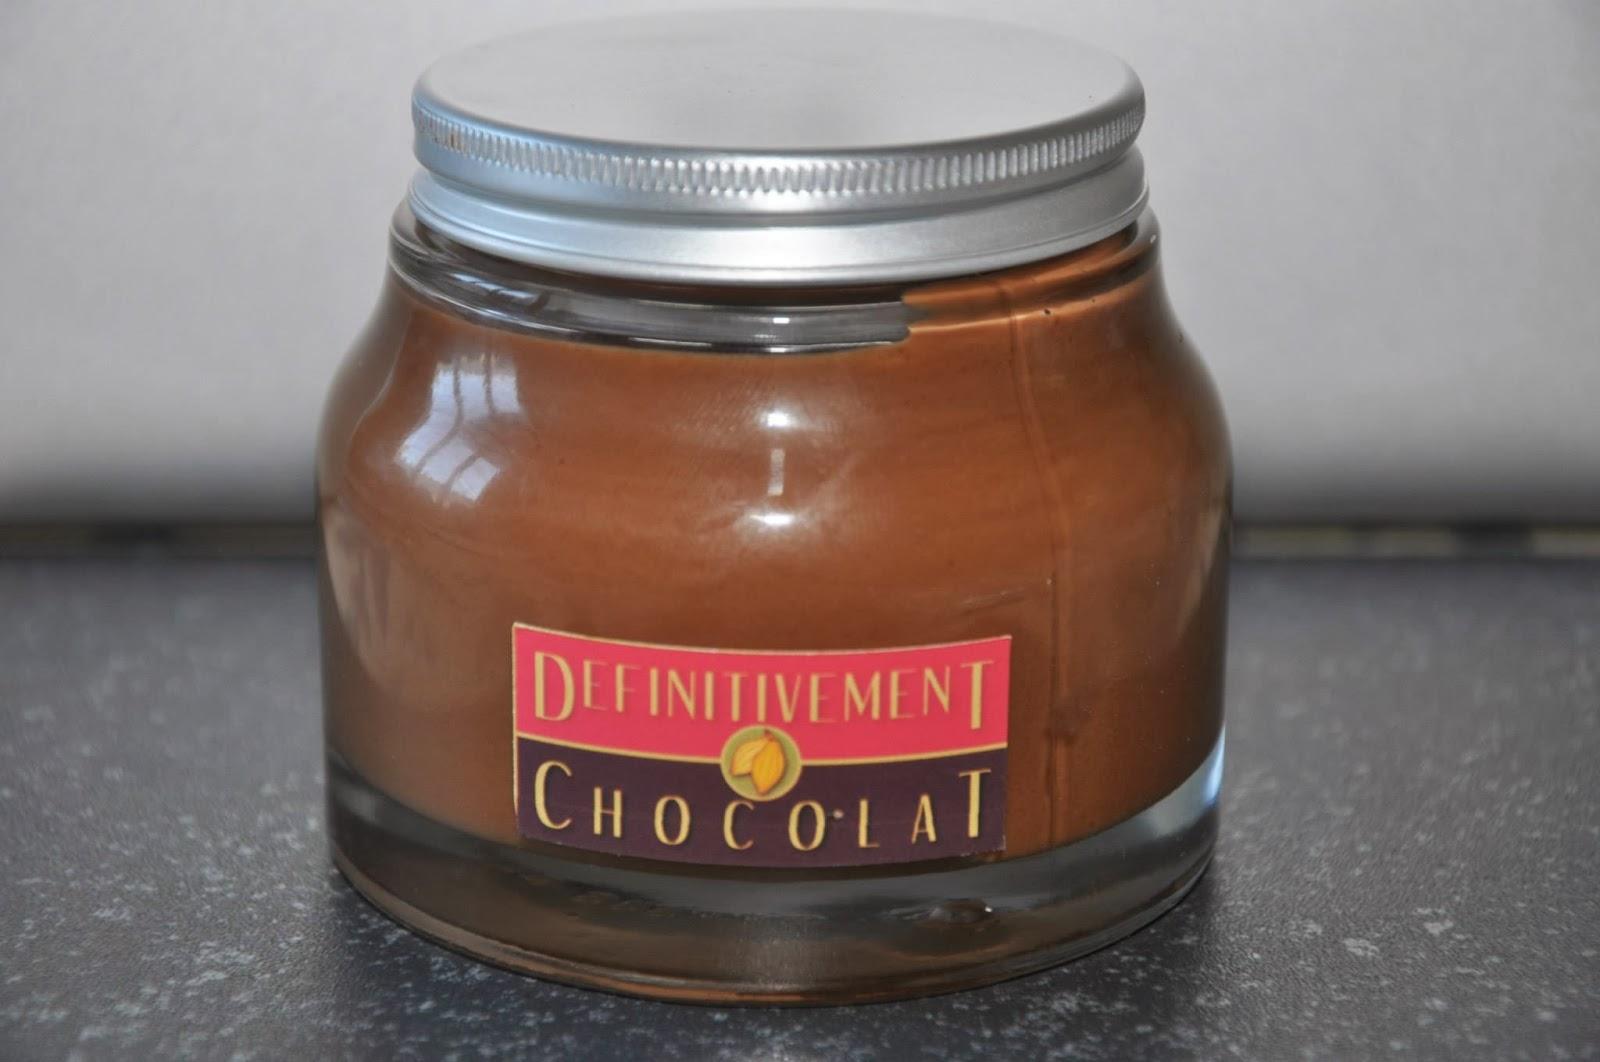 Pâte à tartiner définitivement chocolat